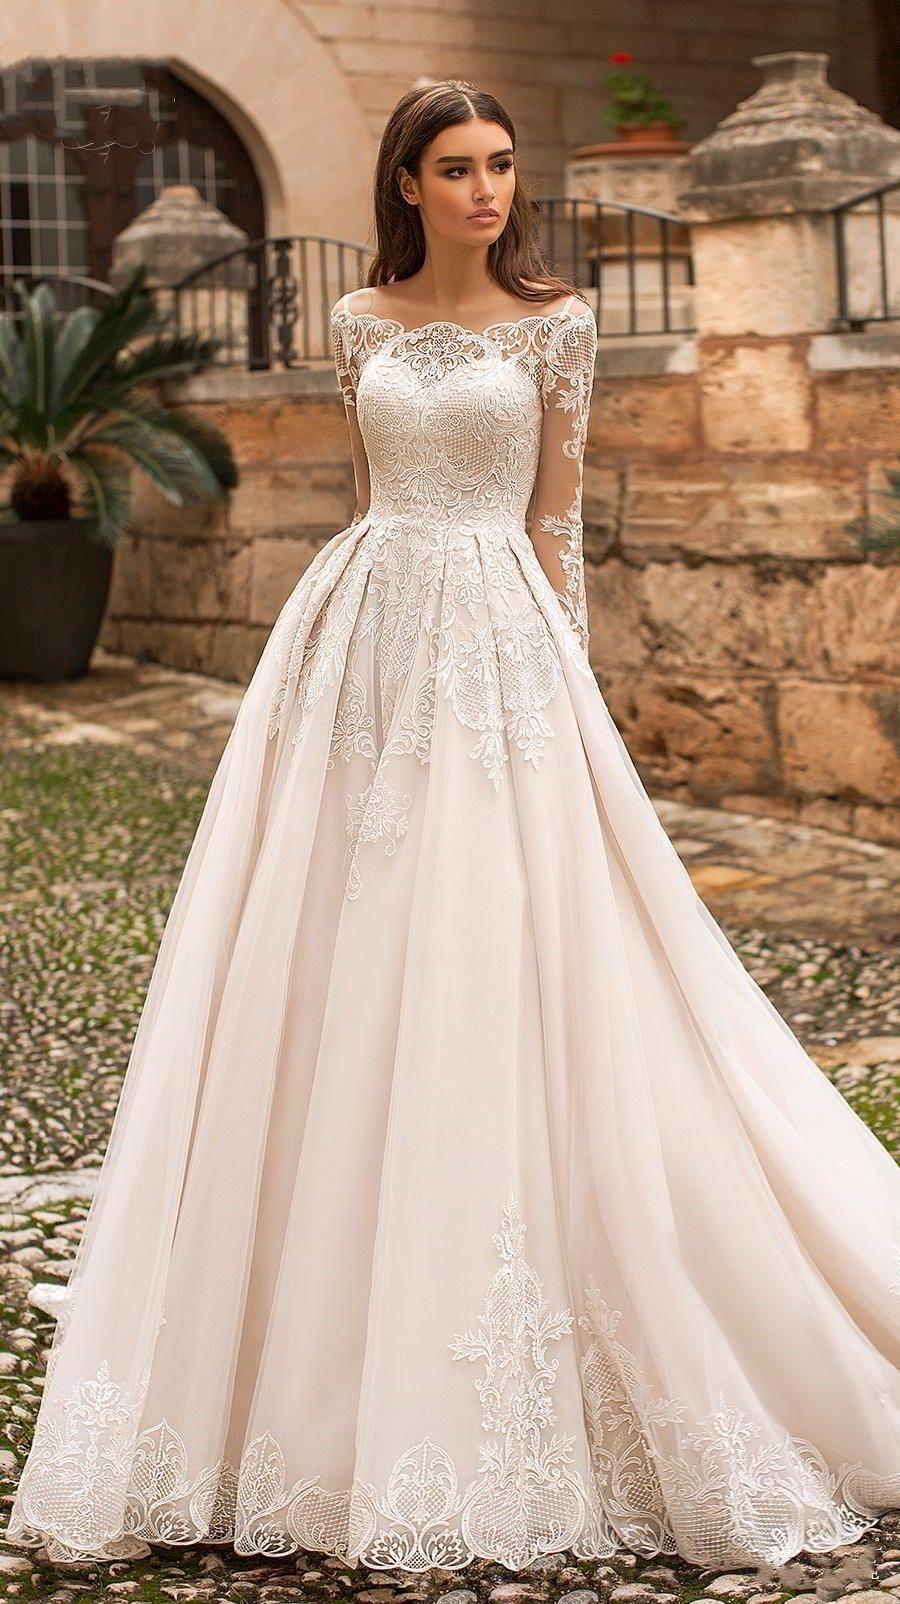 Silver Wedding Dresses Bridal Dresses Near Me Fashion Wedding Gowns 20190207 Long Sleeve Wedding Dress Lace Wedding Dress Long Sleeve Wedding Dress Sleeves